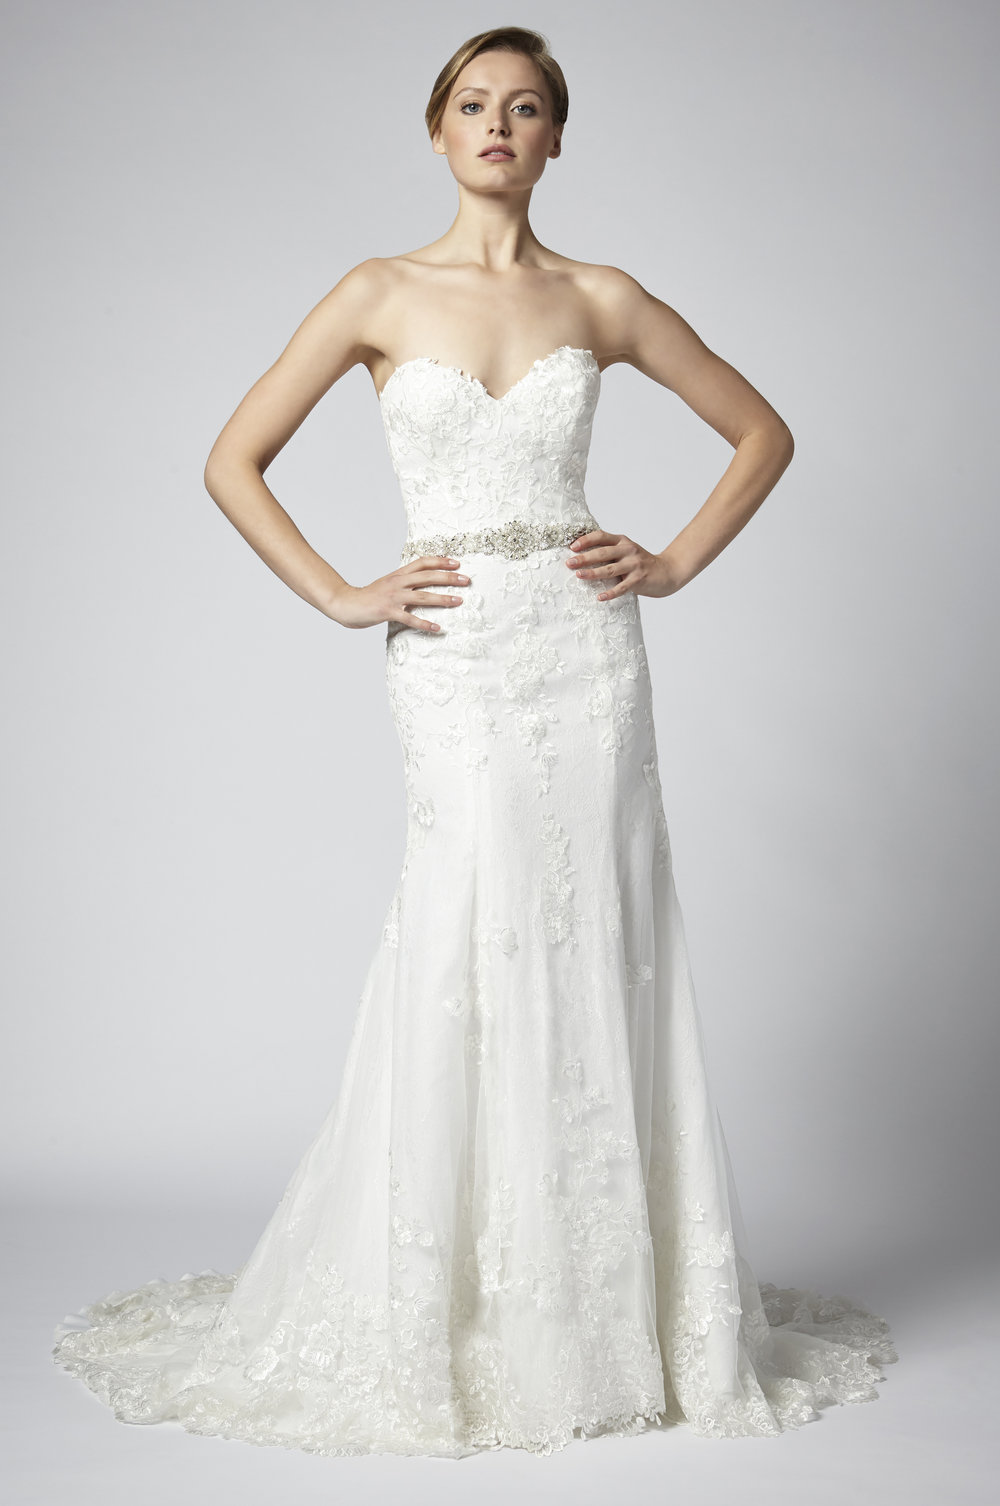 Sweetheart Neckline Fitted Wedding Dress